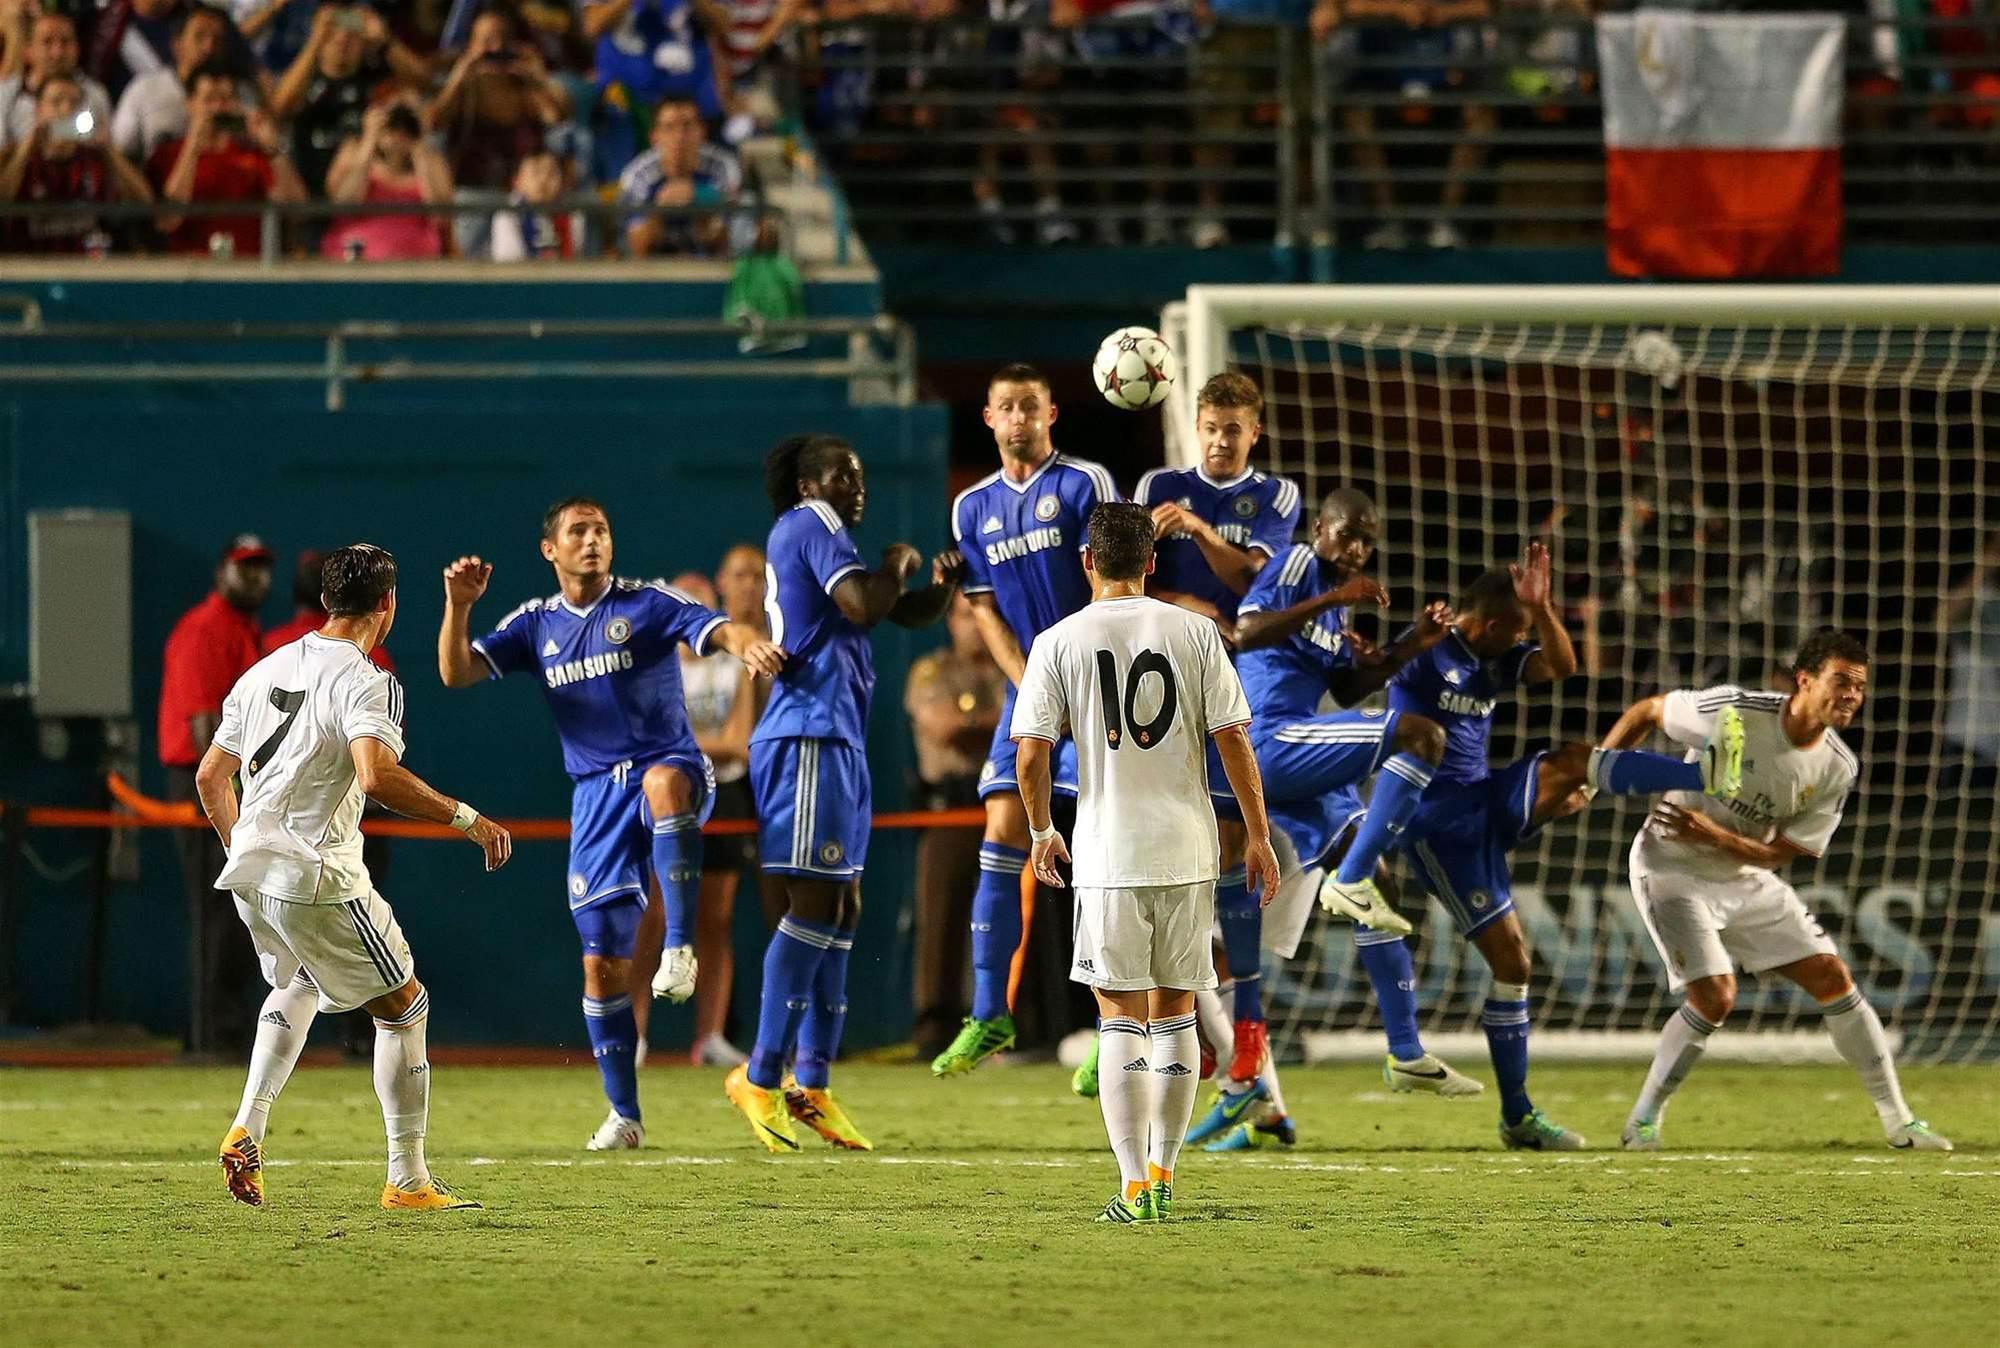 Ronaldo and Real Madrid punish Mourinho and Chelsea